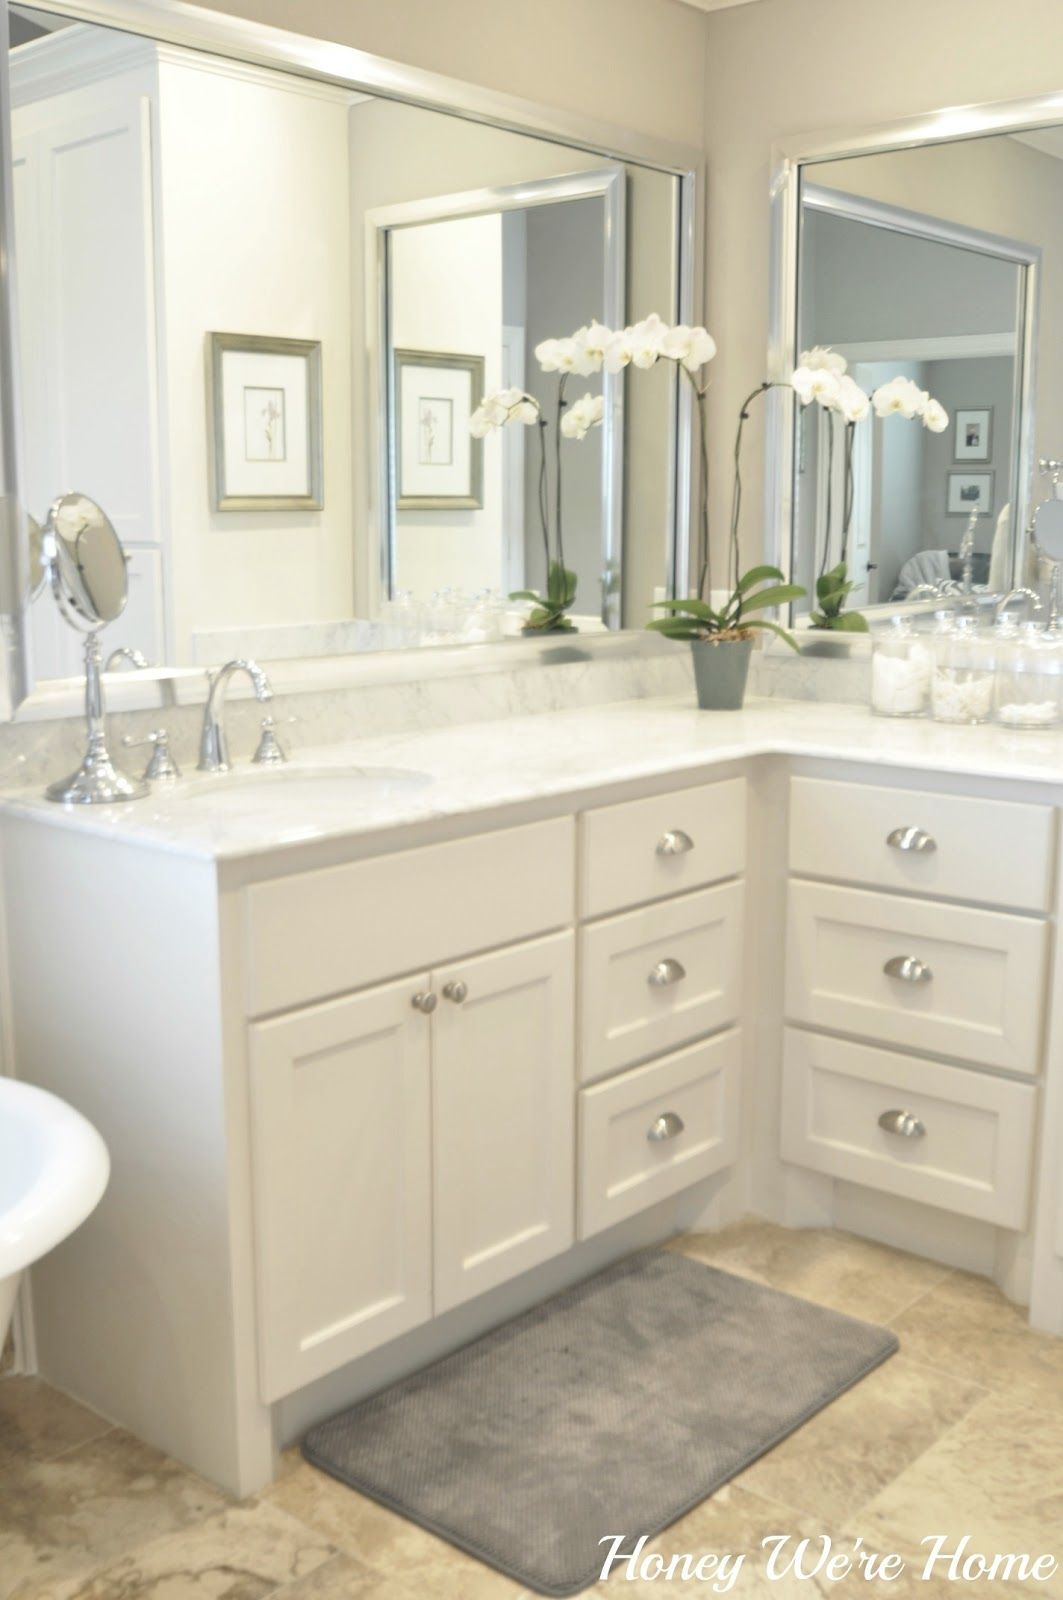 Honey Were Home Master Bath Sherwin Williams Anew Gray Carrara - Crate and barrel bathroom vanity for bathroom decor ideas